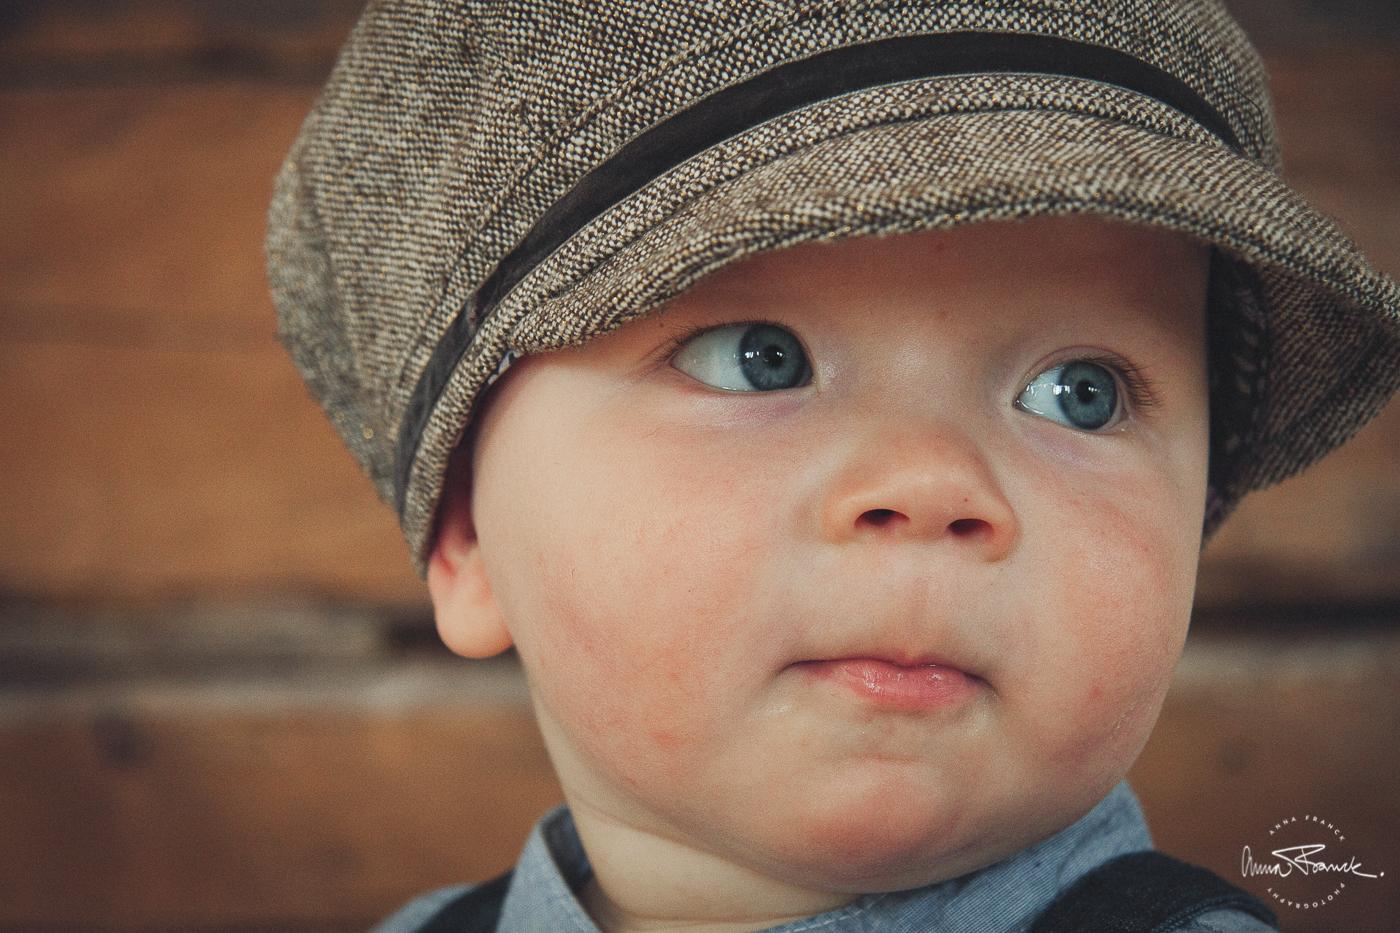 kids, barn, lapsi, muotokuva, porträtt, pargas, parainen, vintage, retro, finland, suomi, hemma, home, kotona